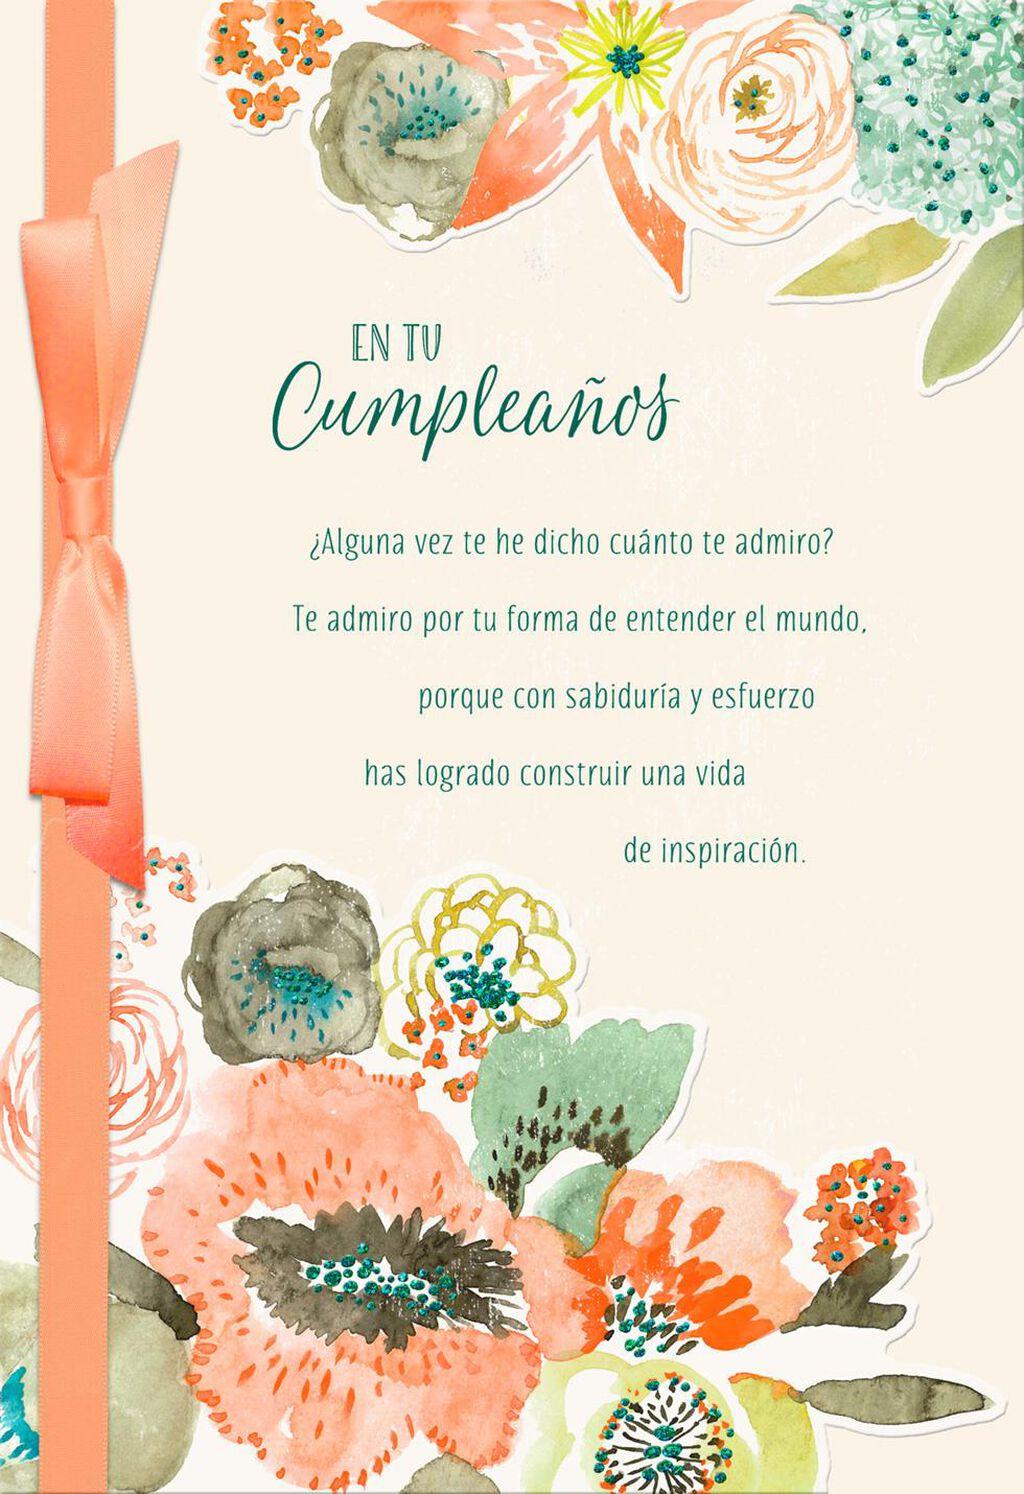 Pastel Flowers Spanish Language Birthday Card